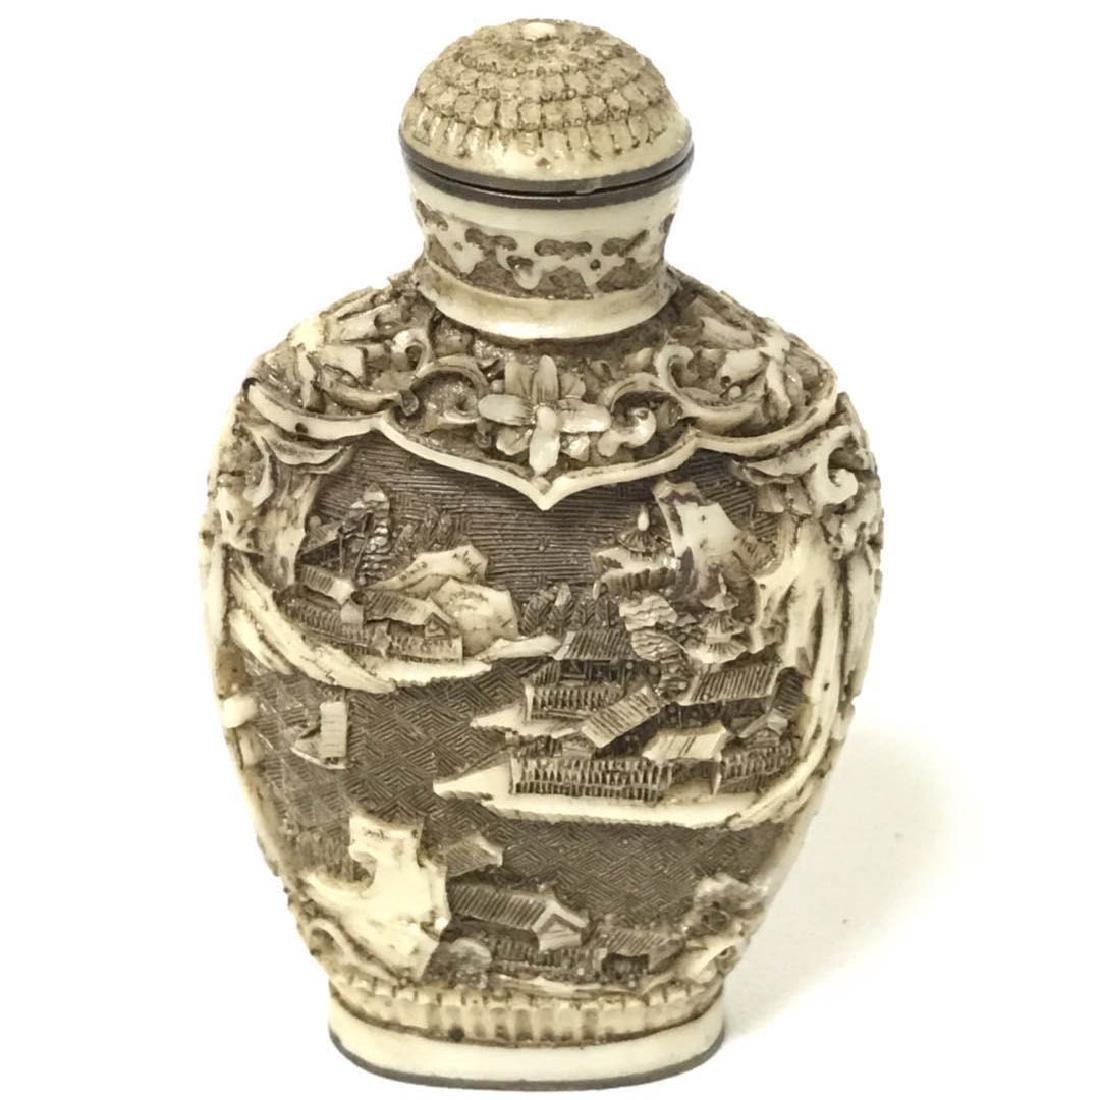 Cinnabar Snuff Bottle